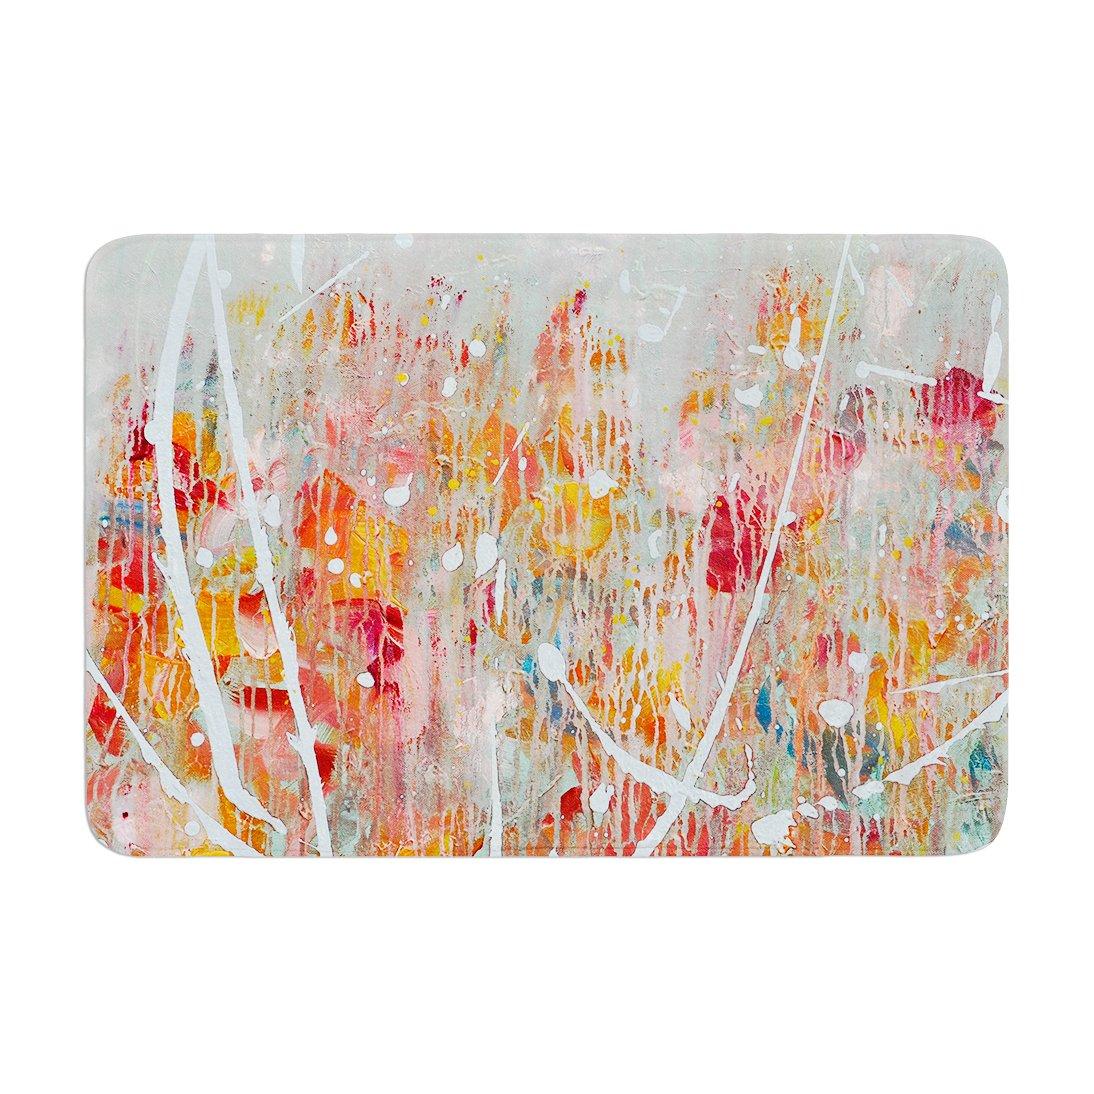 17 by 24 Kess InHouse Iris Lehnhardt Joy Splatter Paint Memory Foam Bath Mat